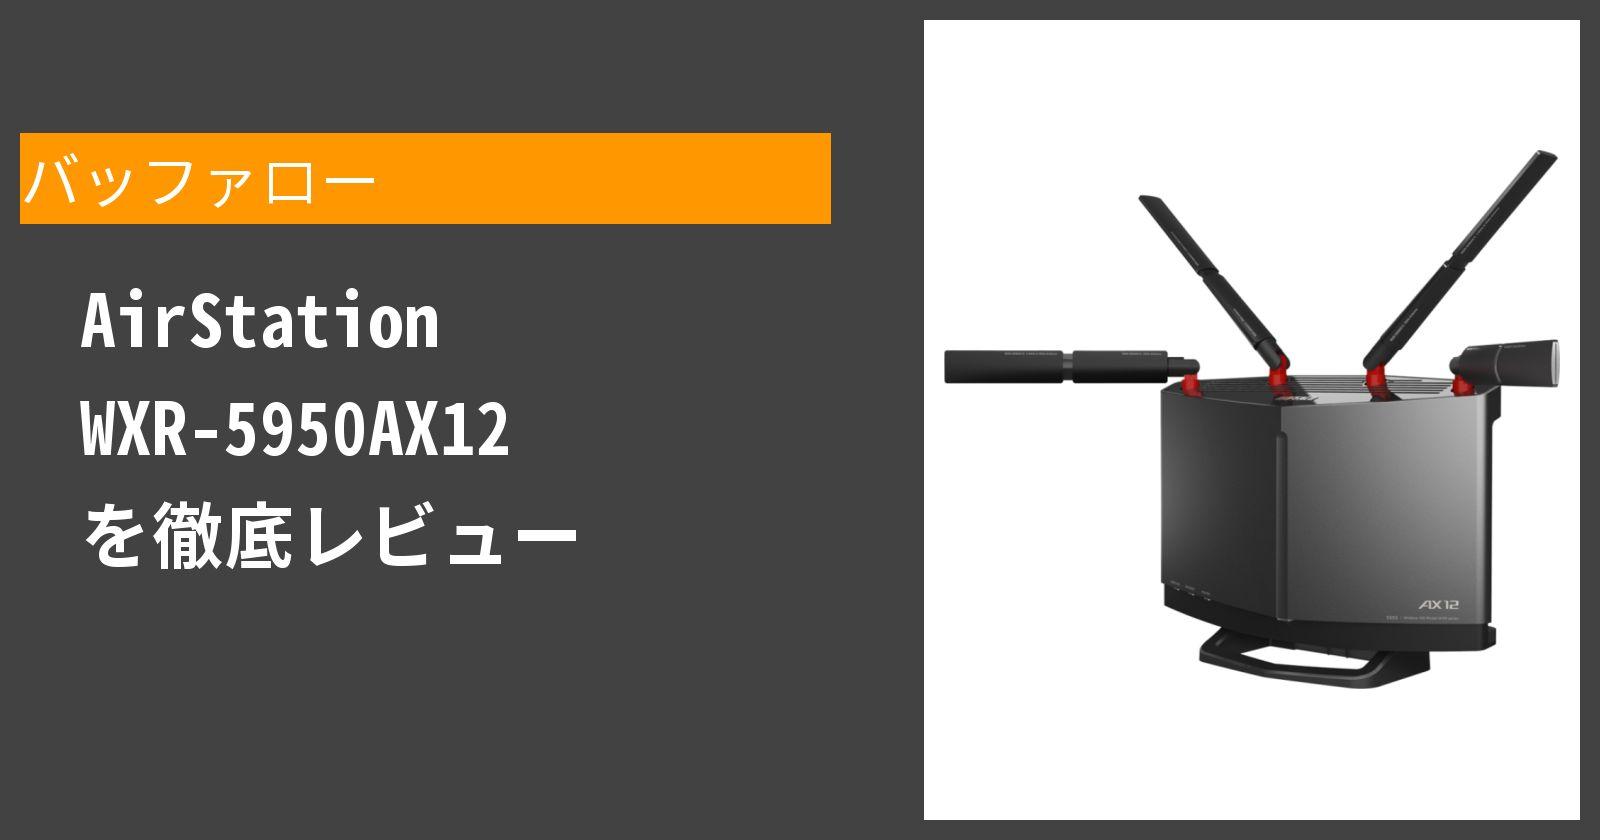 AirStation WXR-5950AX12を徹底評価